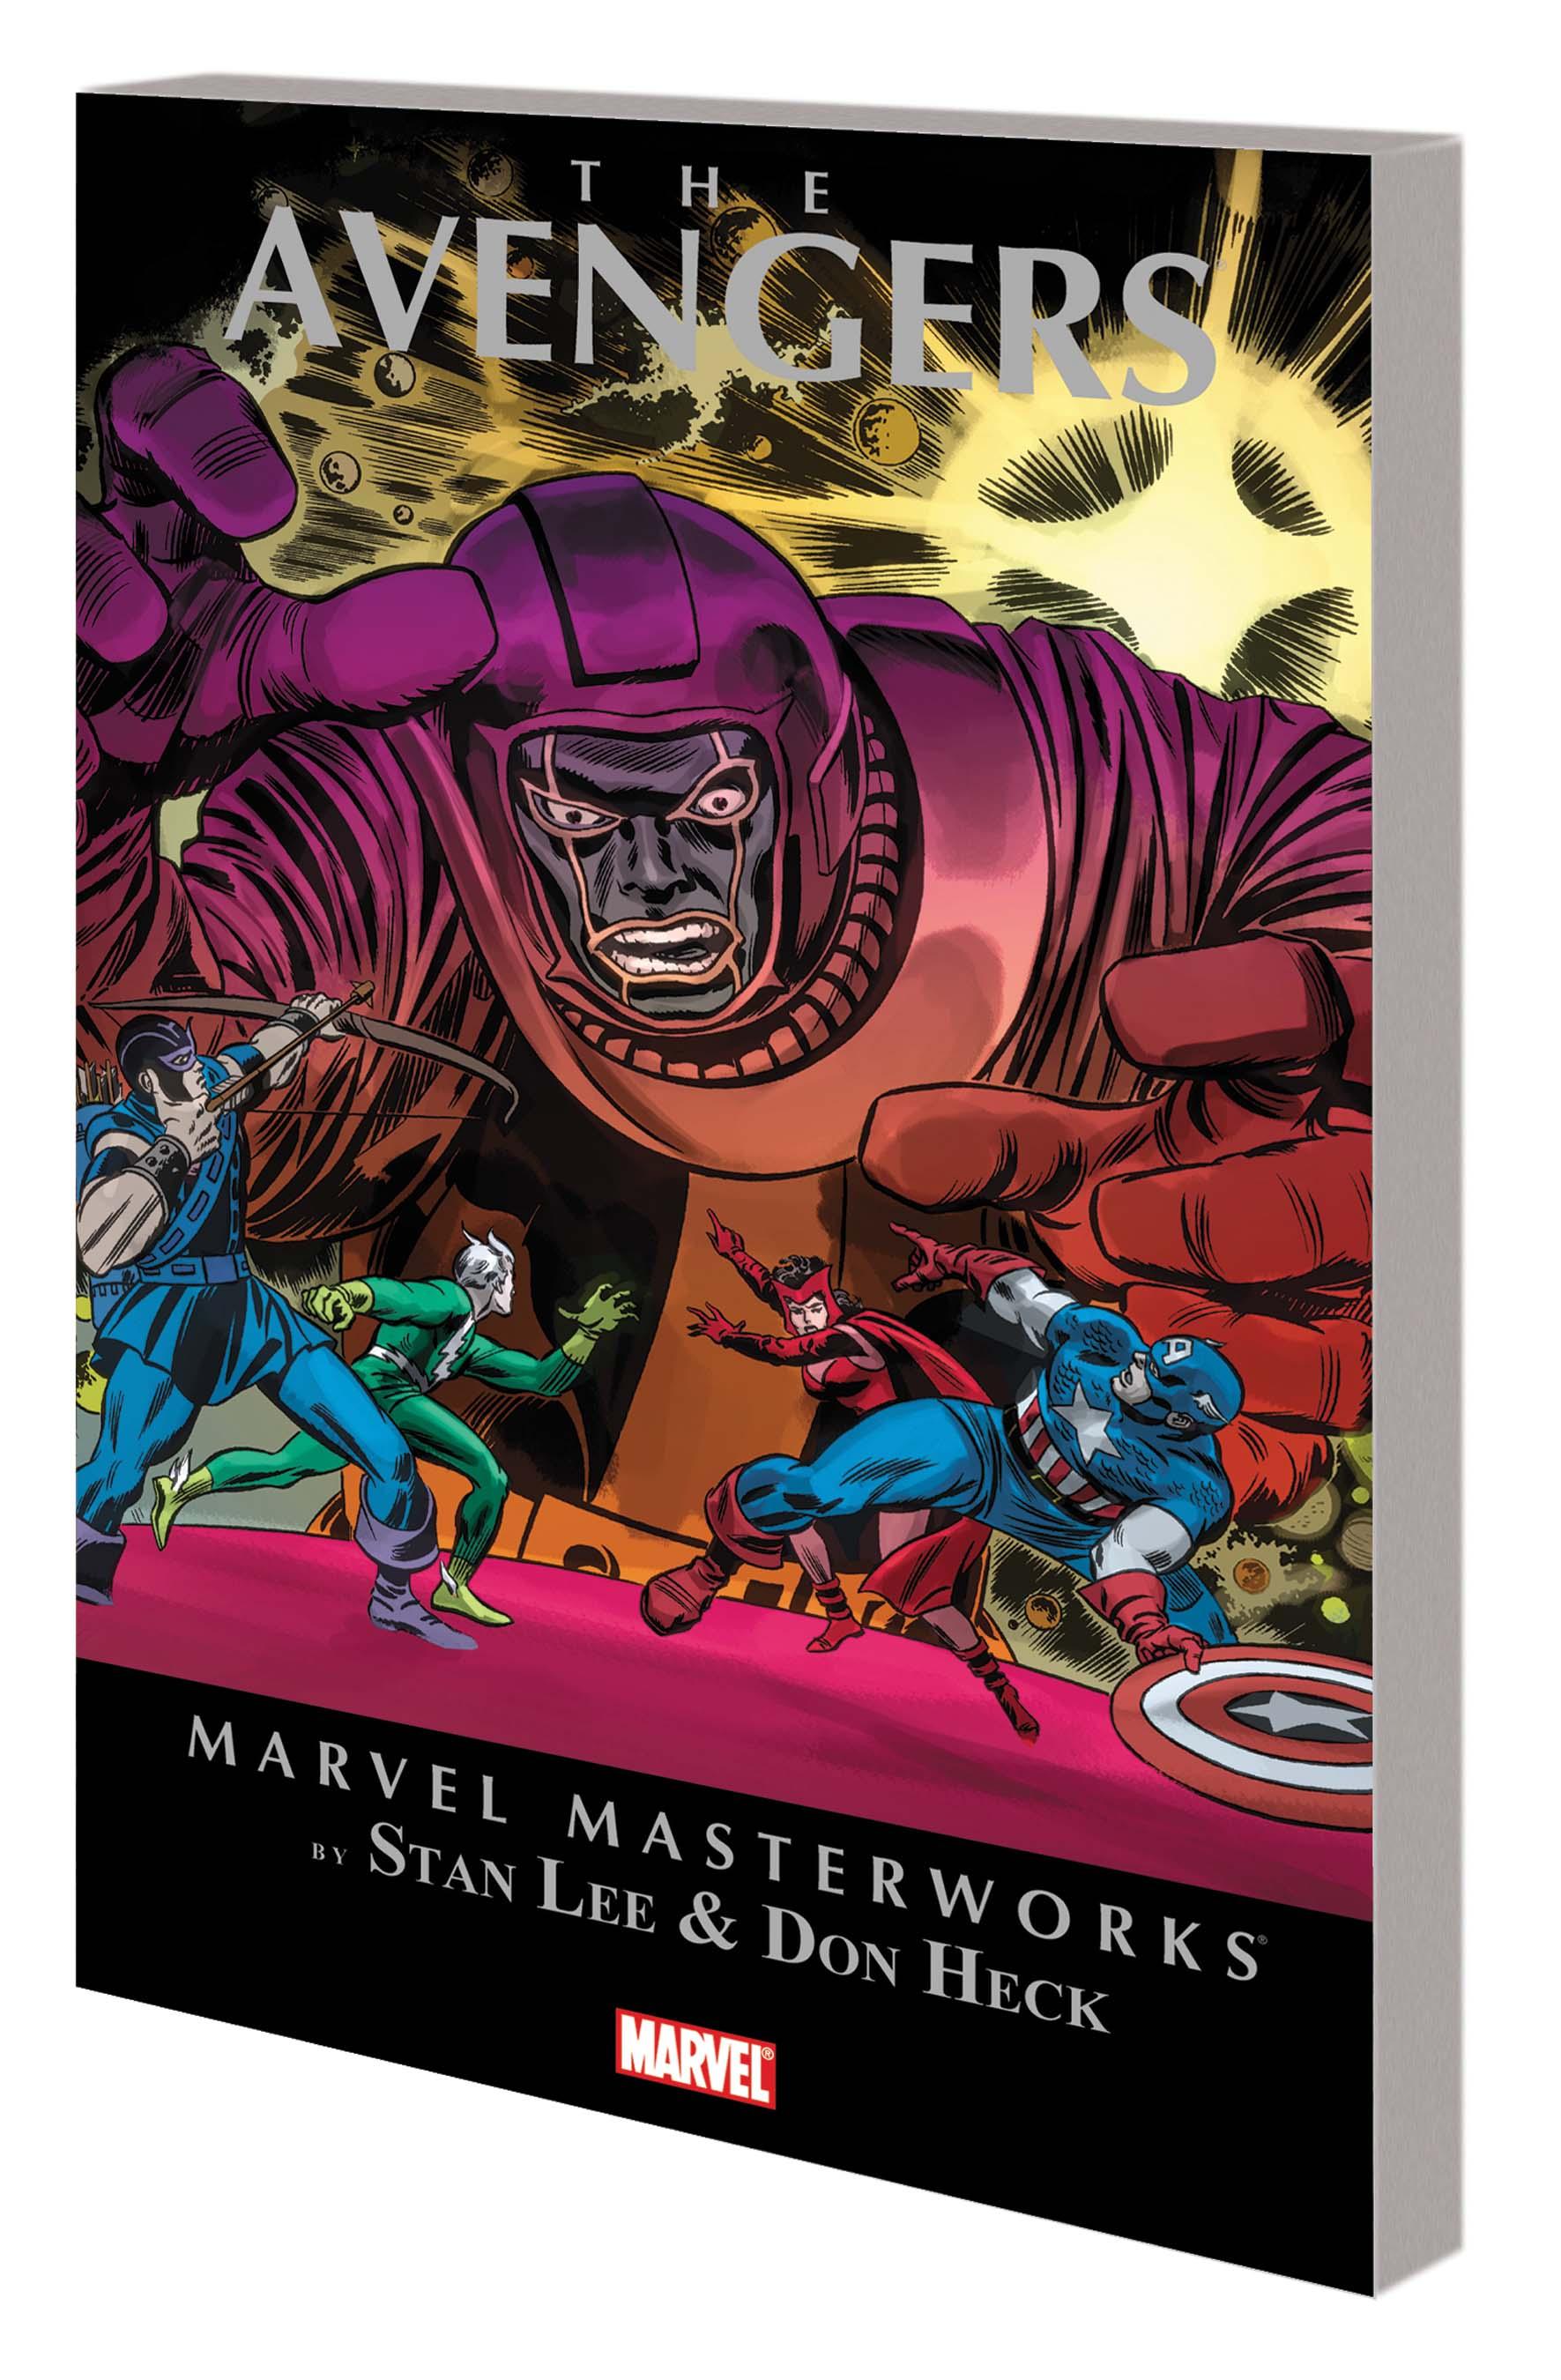 Marvel Masterworks: The Avengers Vol. 3 (Trade Paperback)